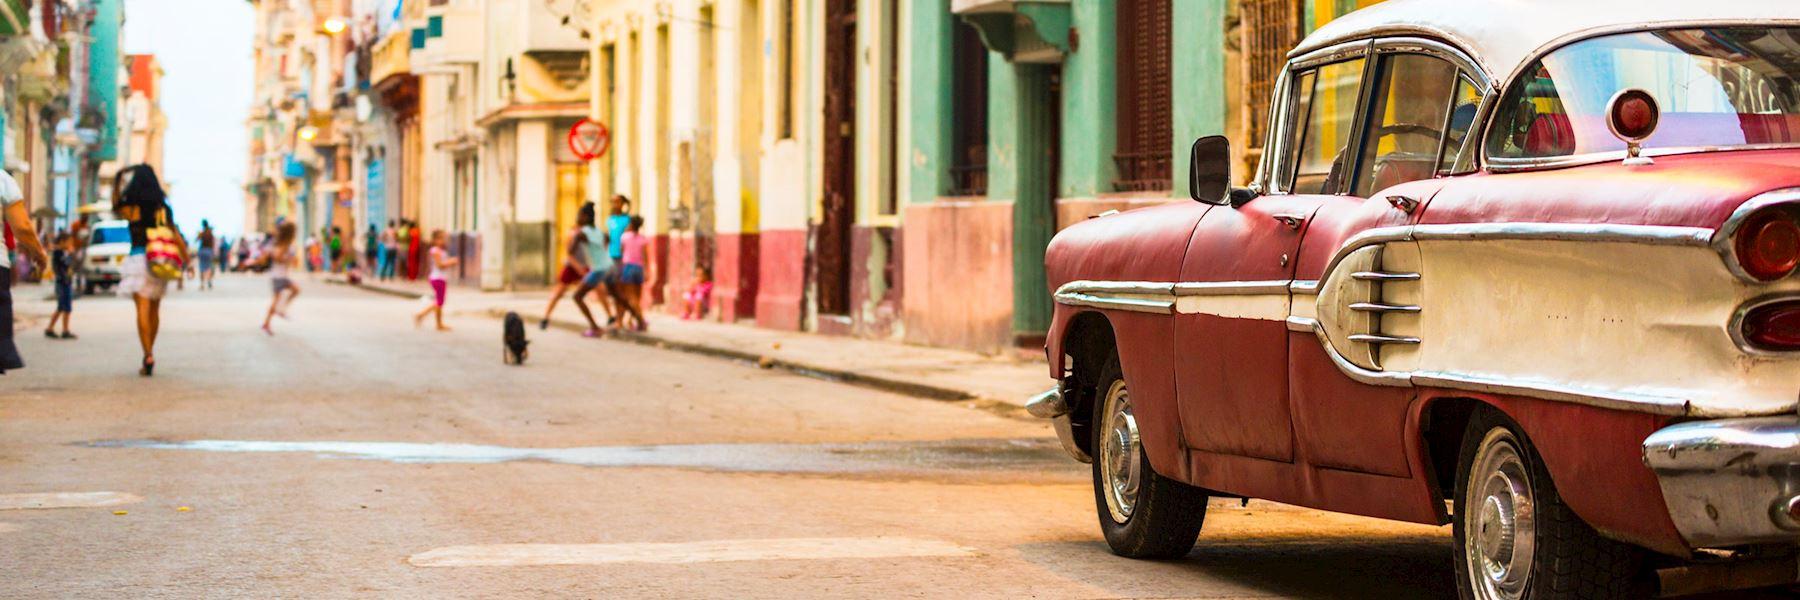 Cuba holidays  2019 & 2020